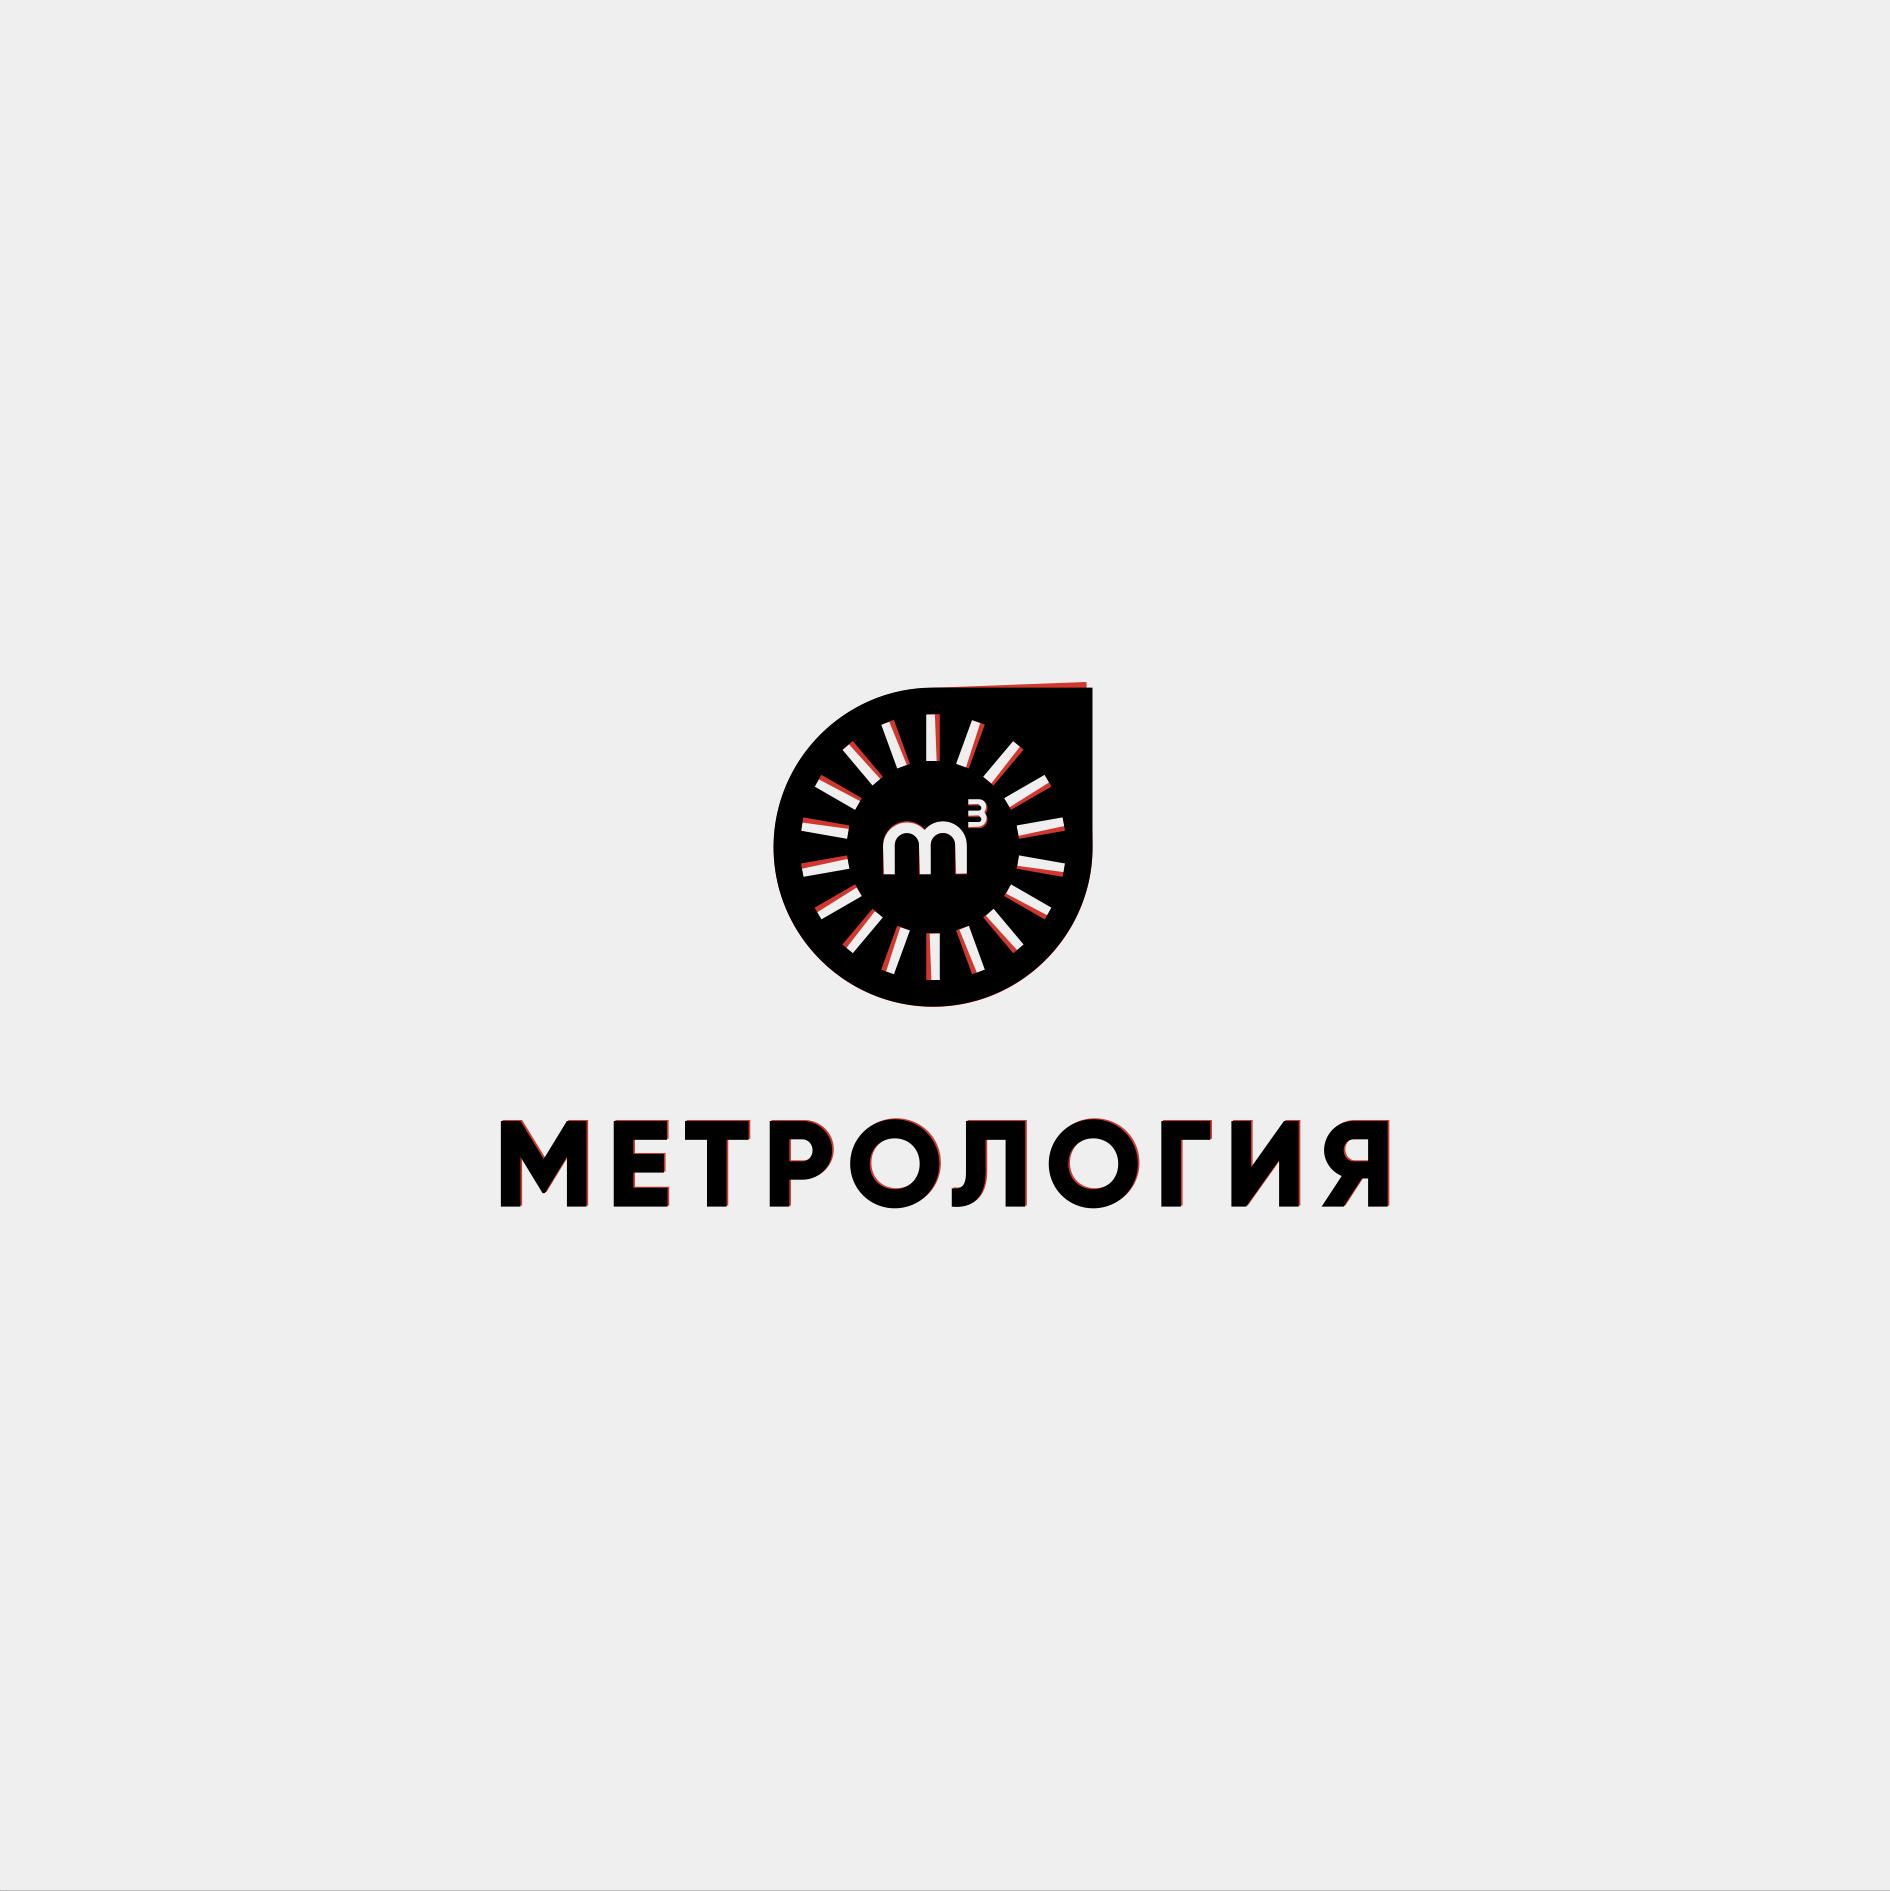 Разработать логотип, визитку, фирменный бланк. фото f_82258f7bc7bd784e.png